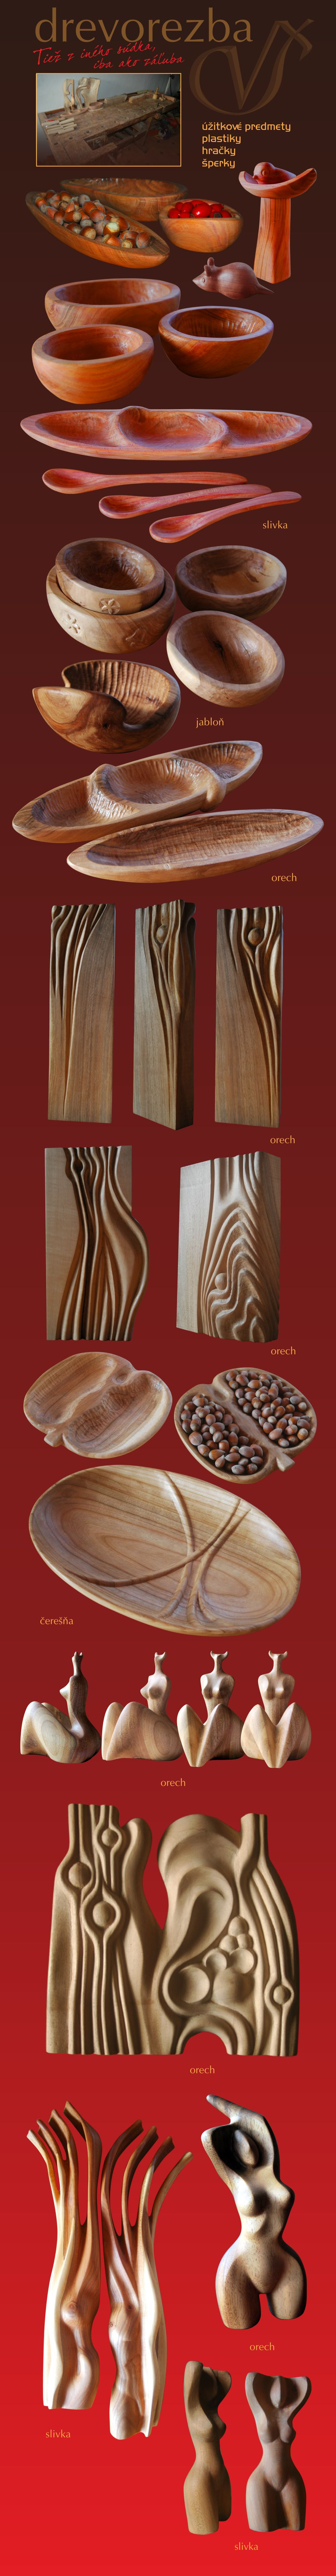 Logo grafika design maľba drevorezba galéria referencie kontakt